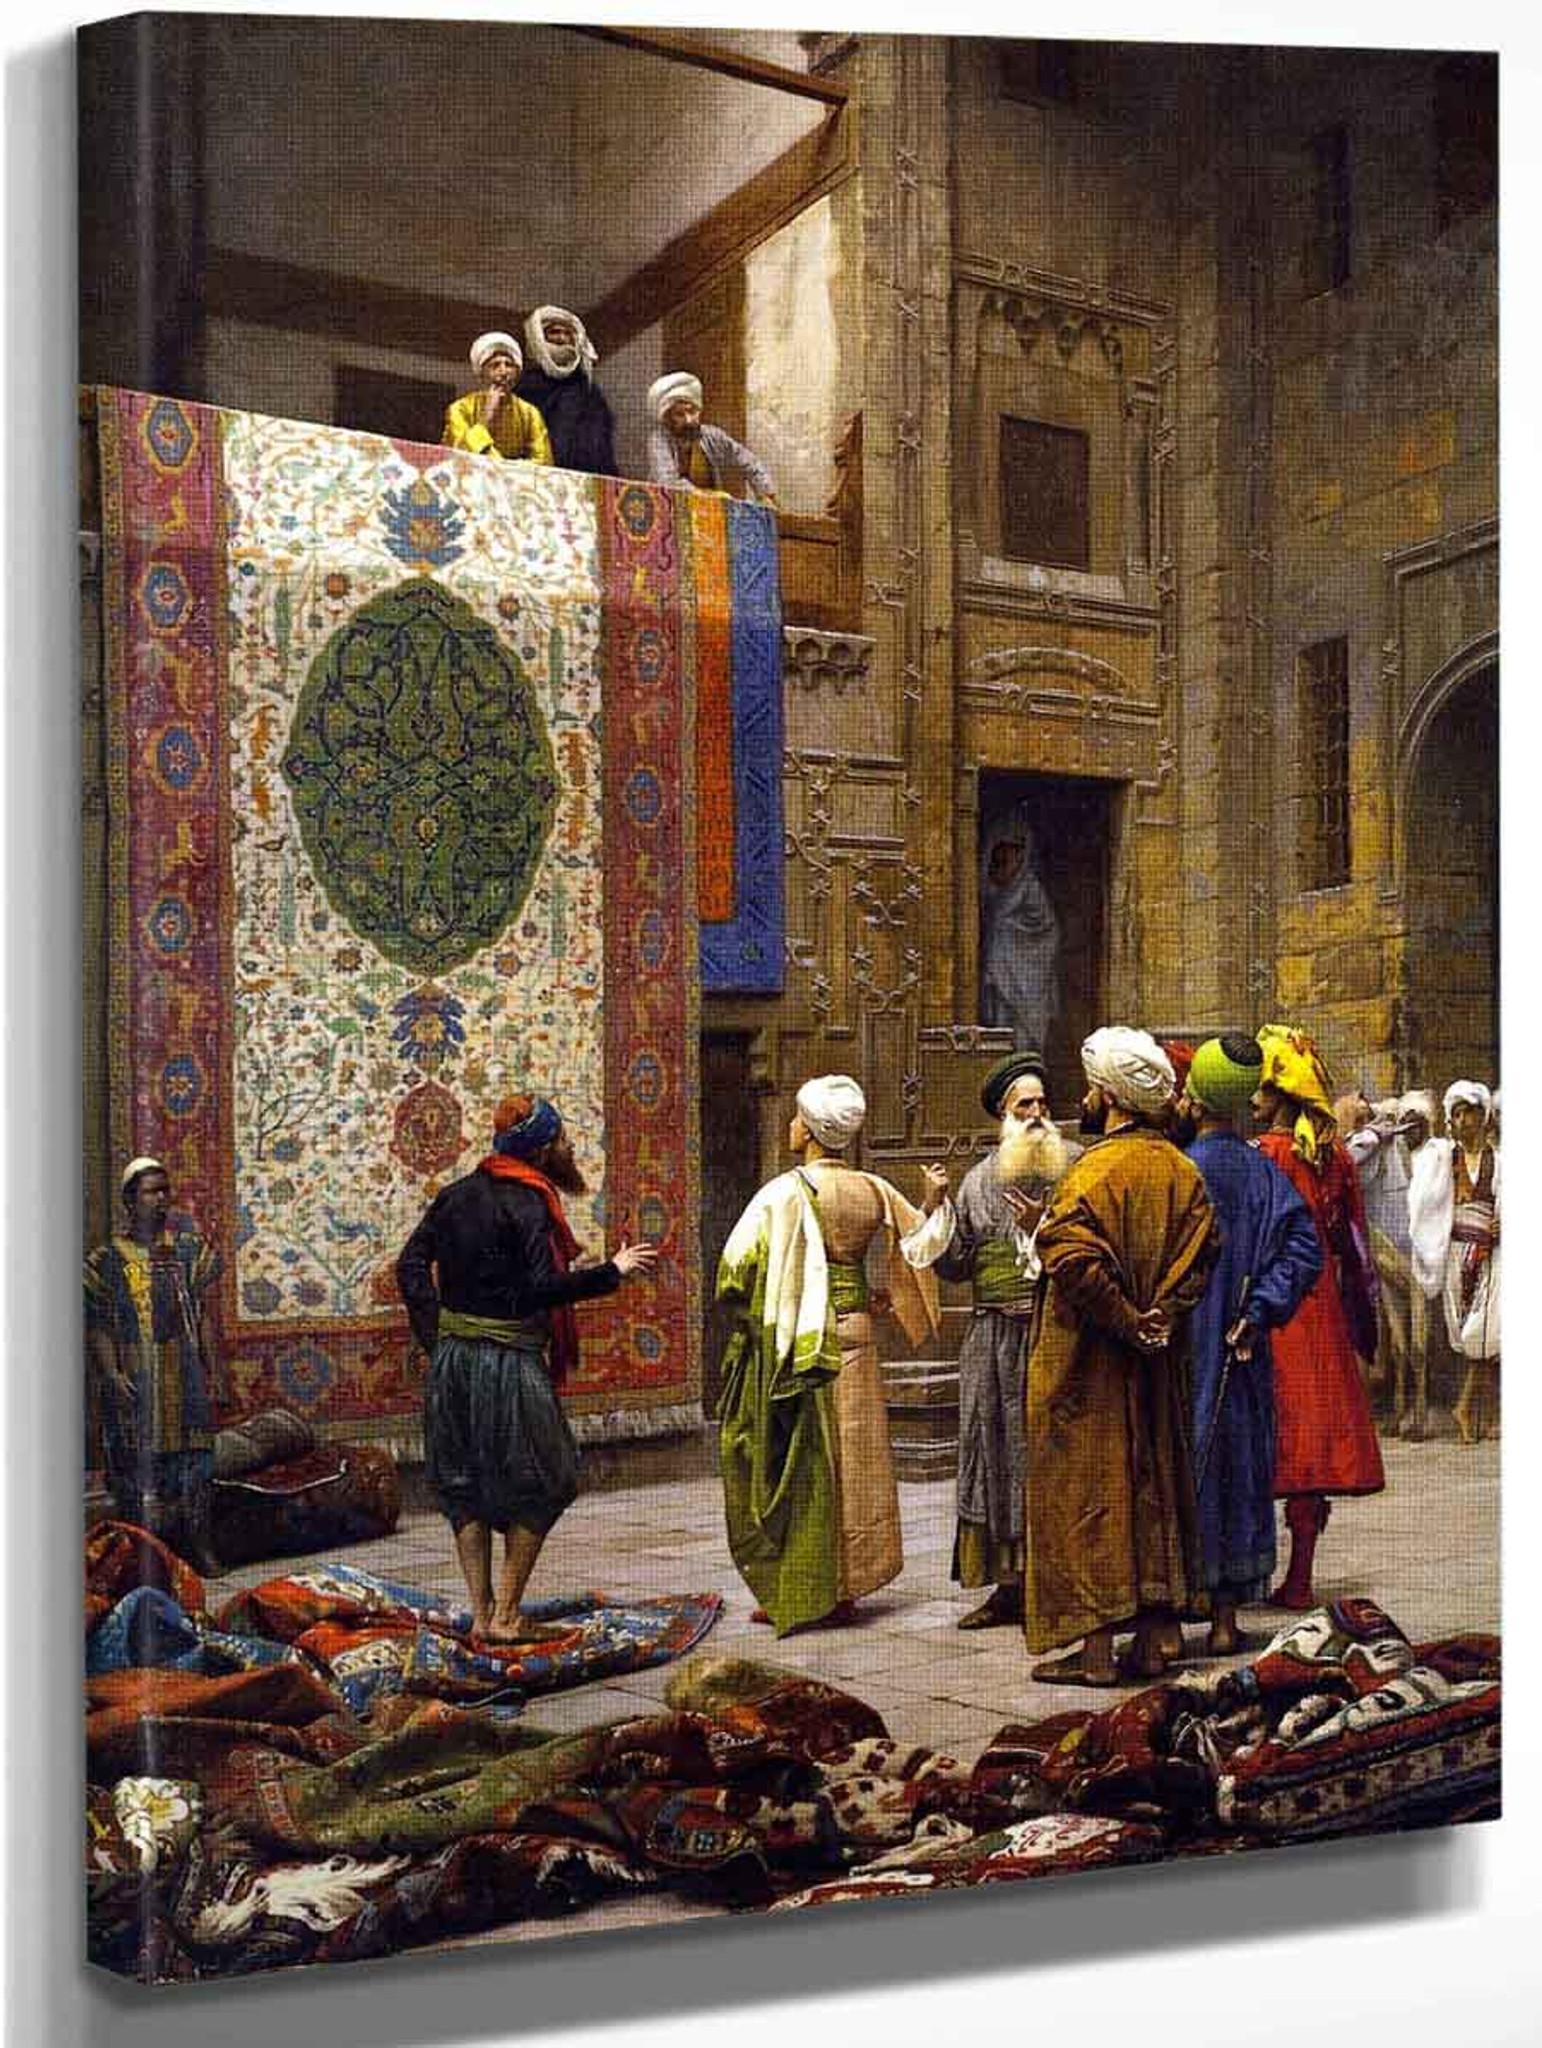 Jean-Léon Gerome Carpet Merchant in Cairo Giclee Canvas Print